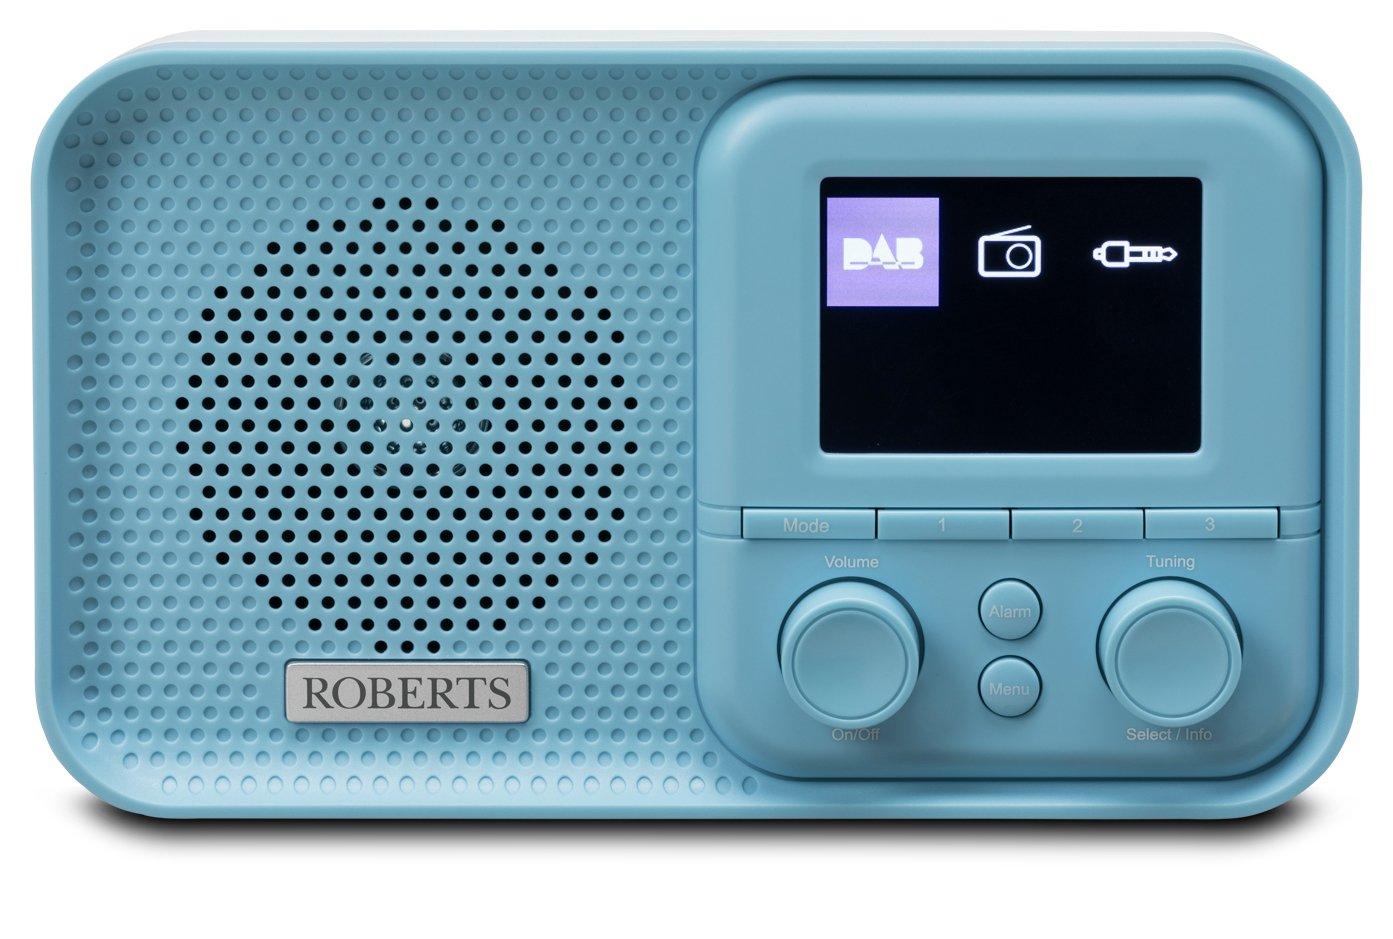 Roberts Play M5 DAB Radio - Blue